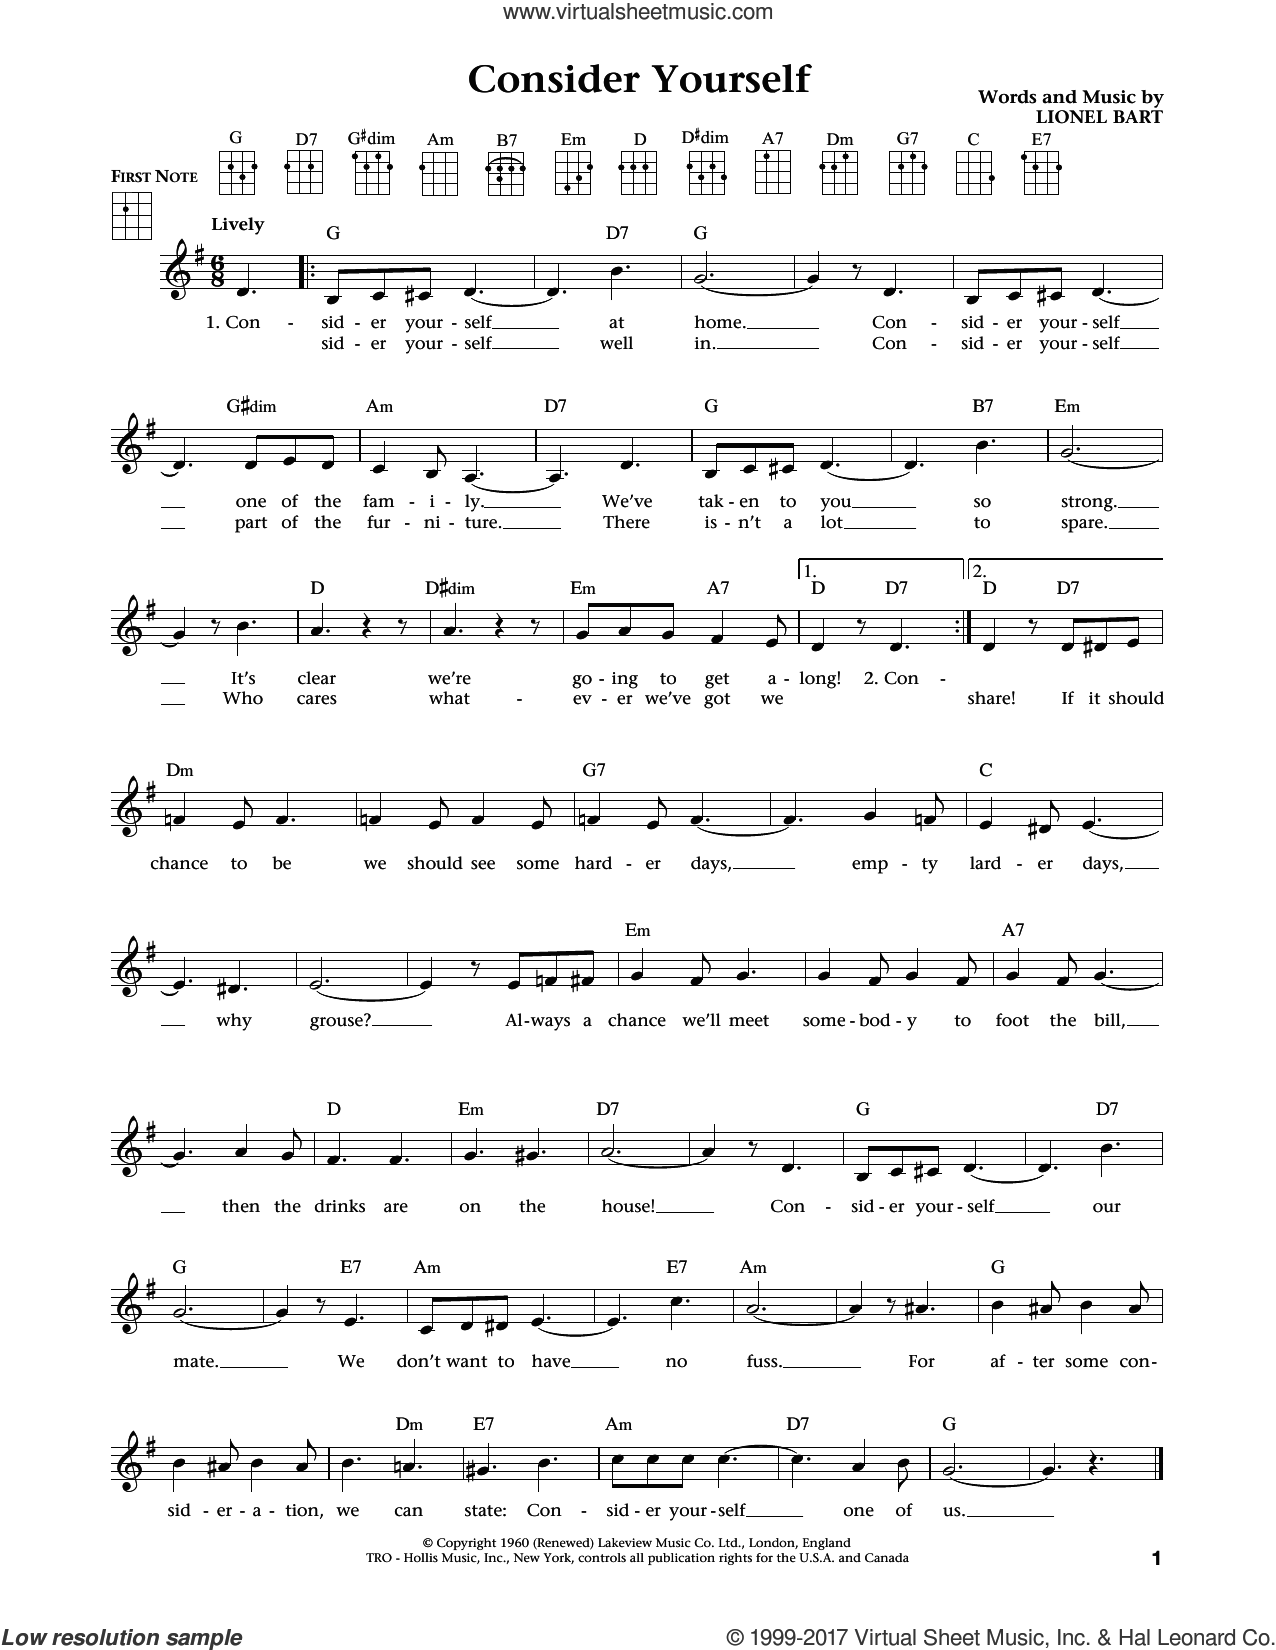 Consider Yourself (from The Daily Ukulele) (arr. Liz and Jim Beloff) sheet music for ukulele by Lionel Bart, Jim Beloff, Liz Beloff, Mark Lester, Jack Wild and Michael Goodman, Bruce Prochnik, intermediate skill level